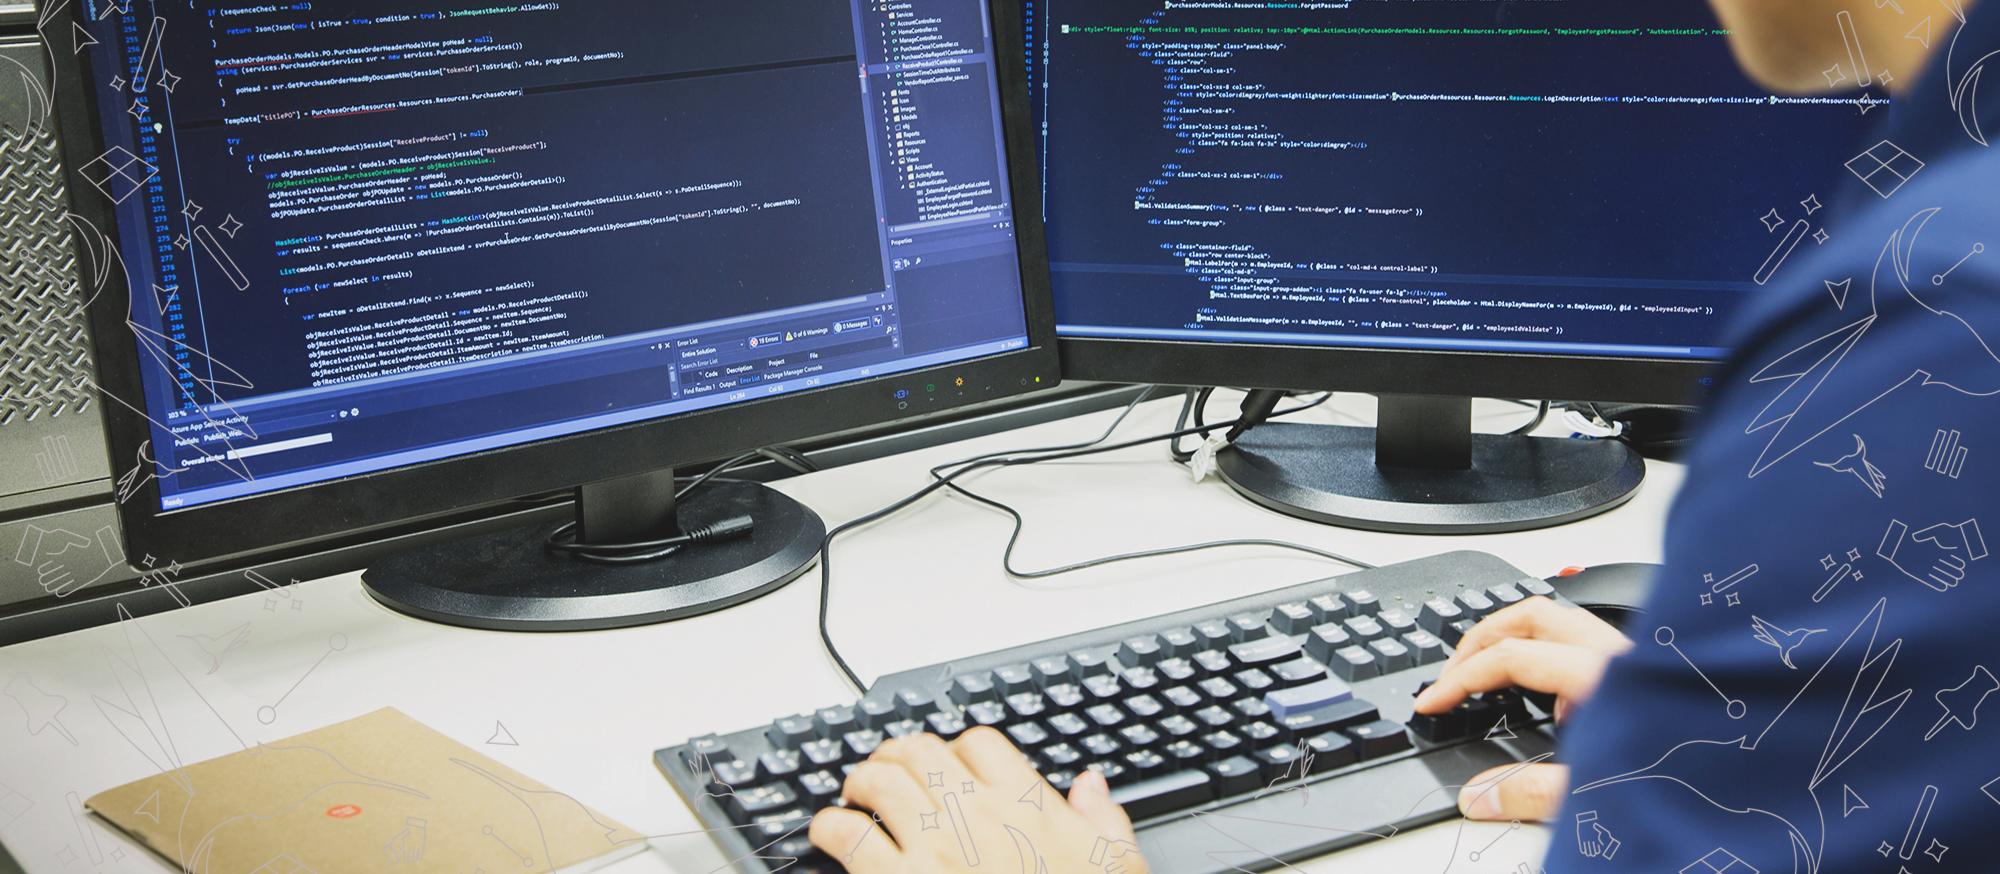 Online Coding Courses - Man doing coding